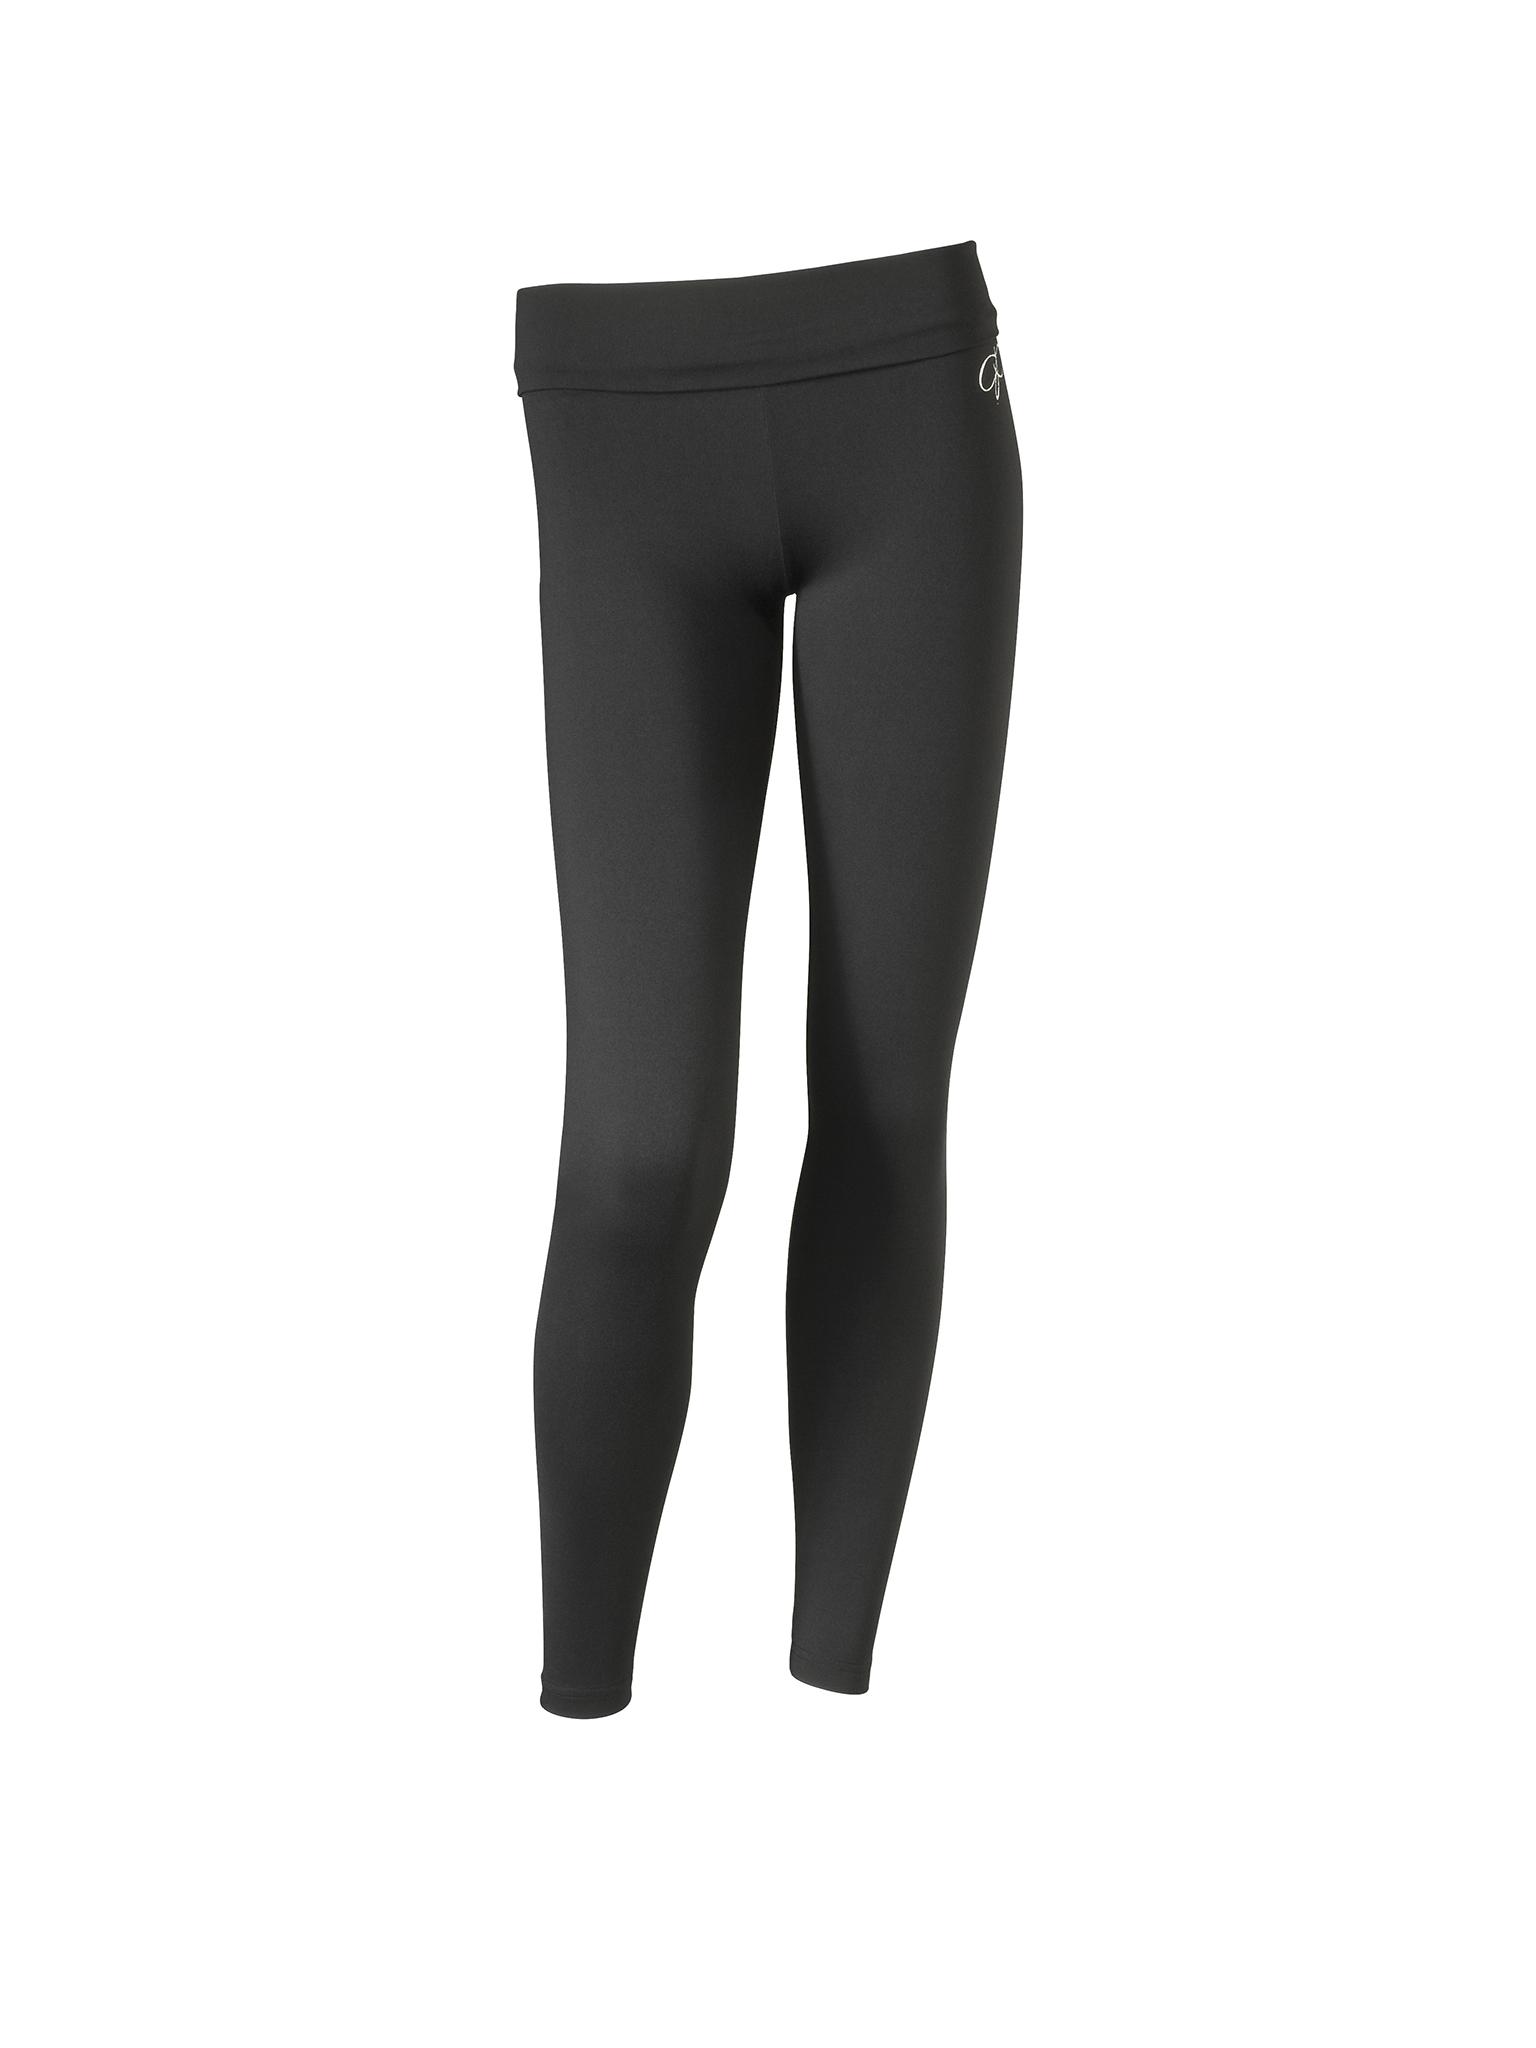 Papillon Legging Hoge Taille supplex Dames - Zwart